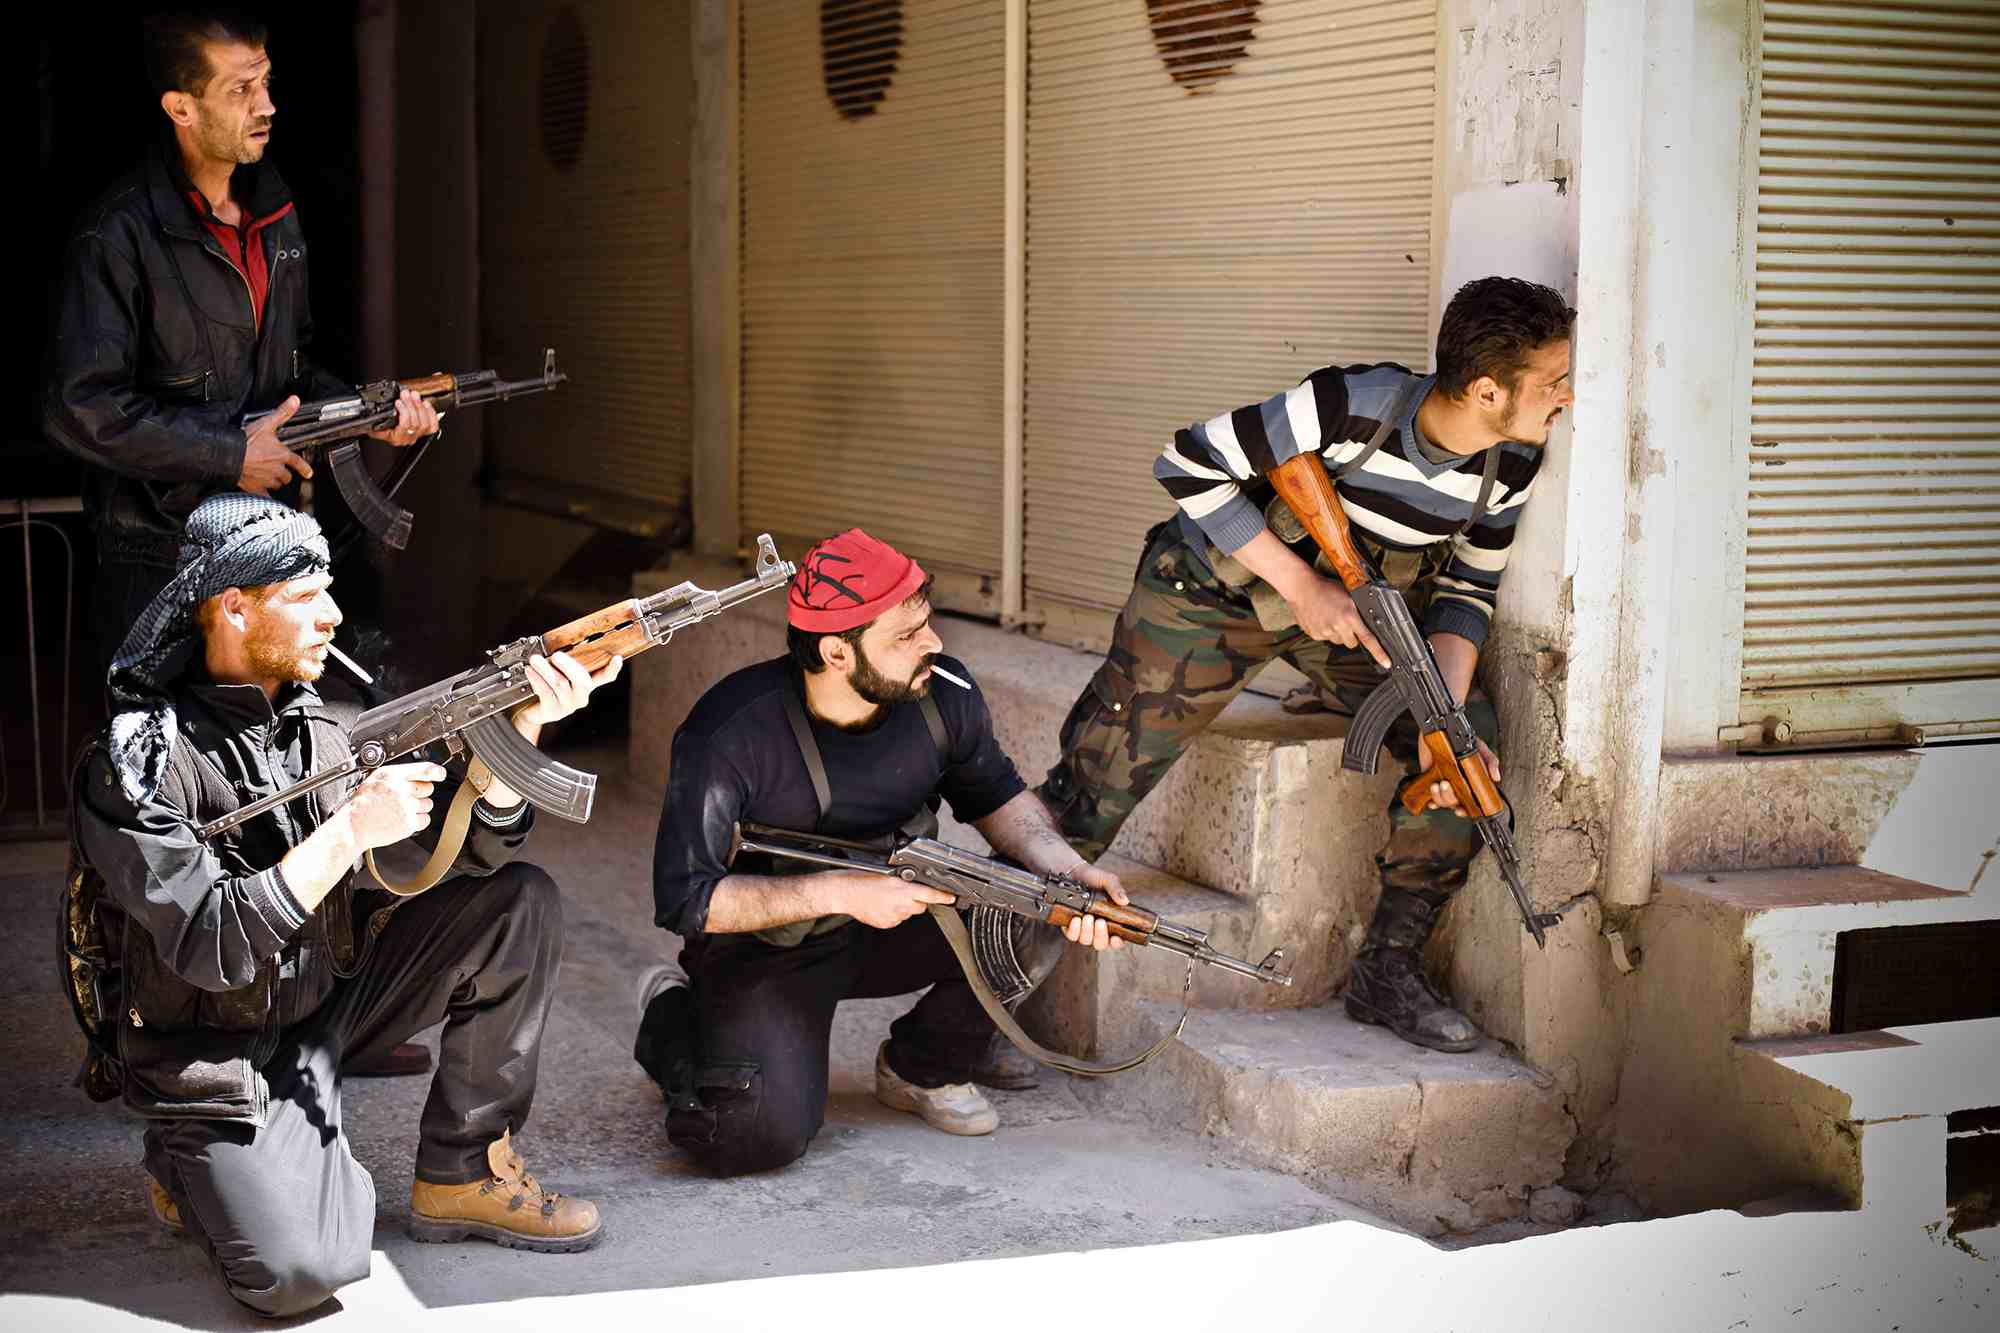 syrian civil war explained